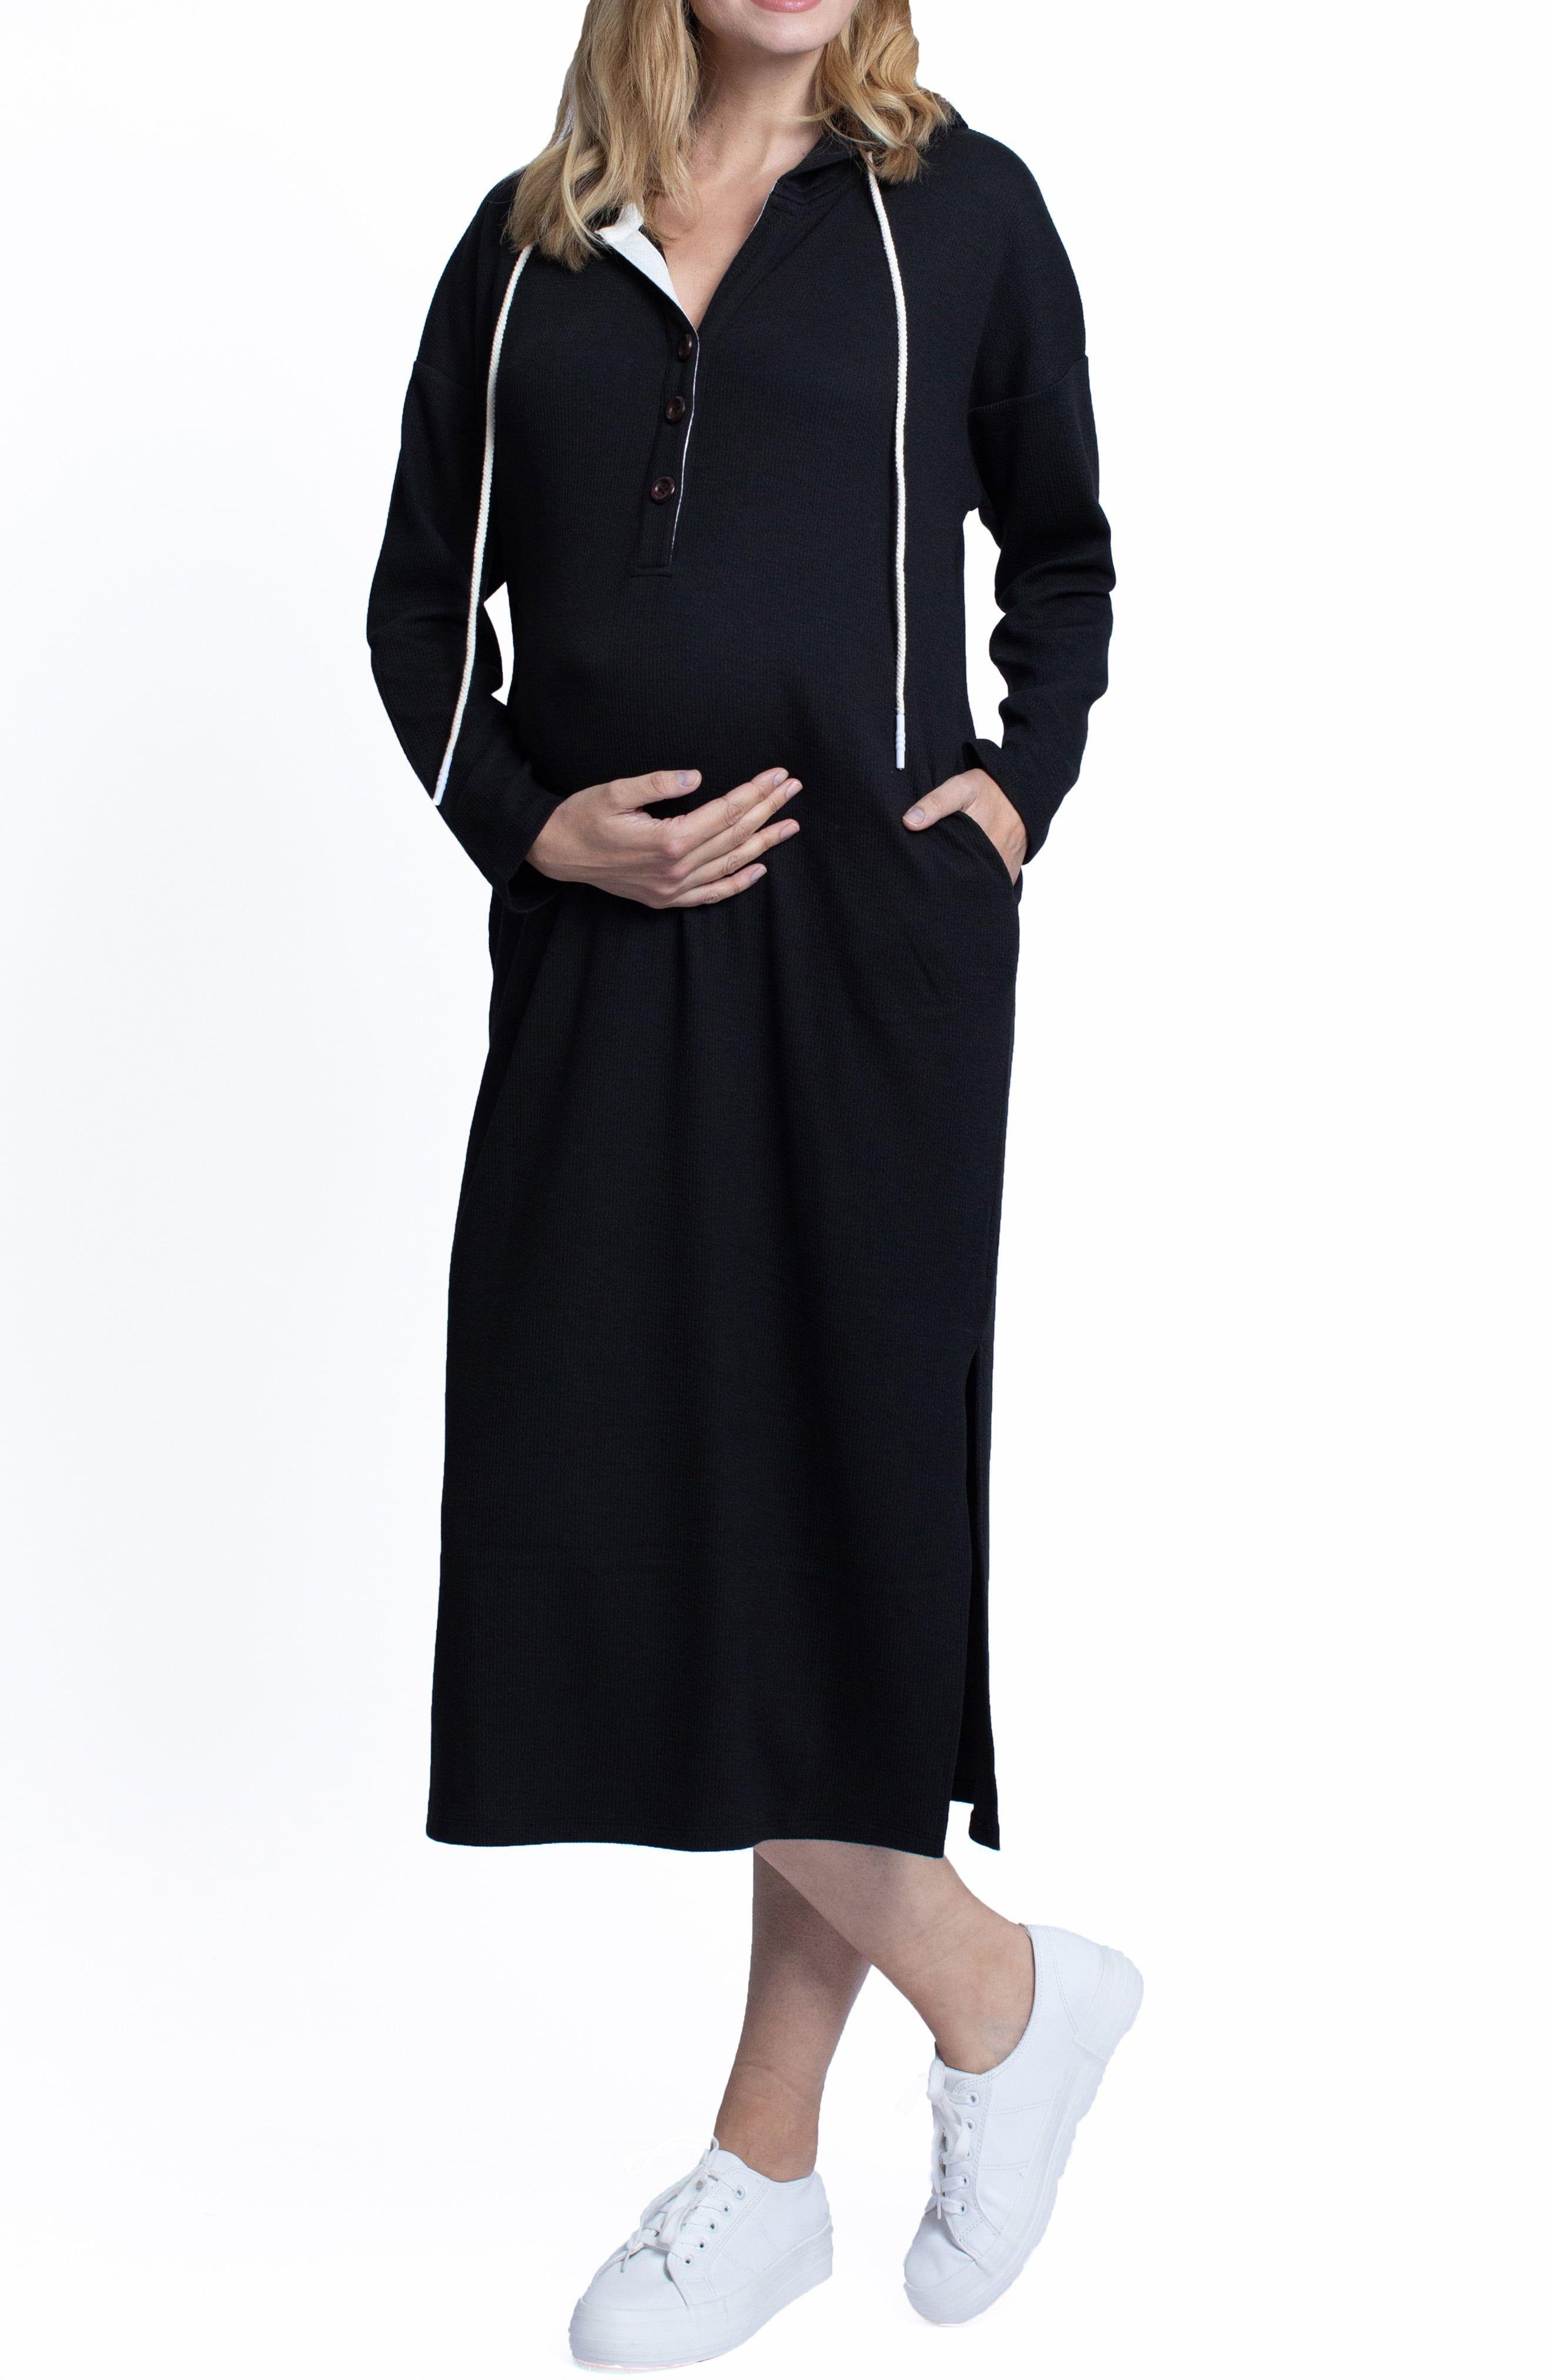 Angel Maternity Oversize Long Sleeve Maternity Hoodie Dress Nordstrom Long Hoodie Dress Hoodie Dress Maternity Hoodie [ 4048 x 2640 Pixel ]